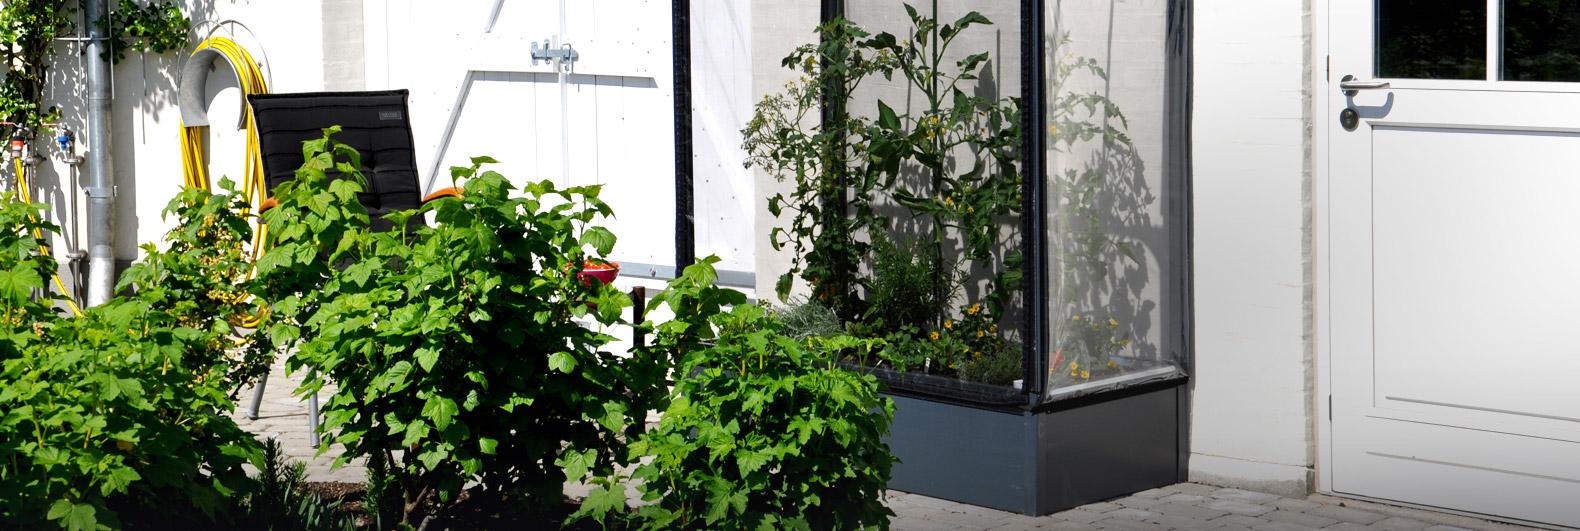 Clepsydre le bel objet growcamp fabricant de mobilier - Cuisine direct fabricant ...